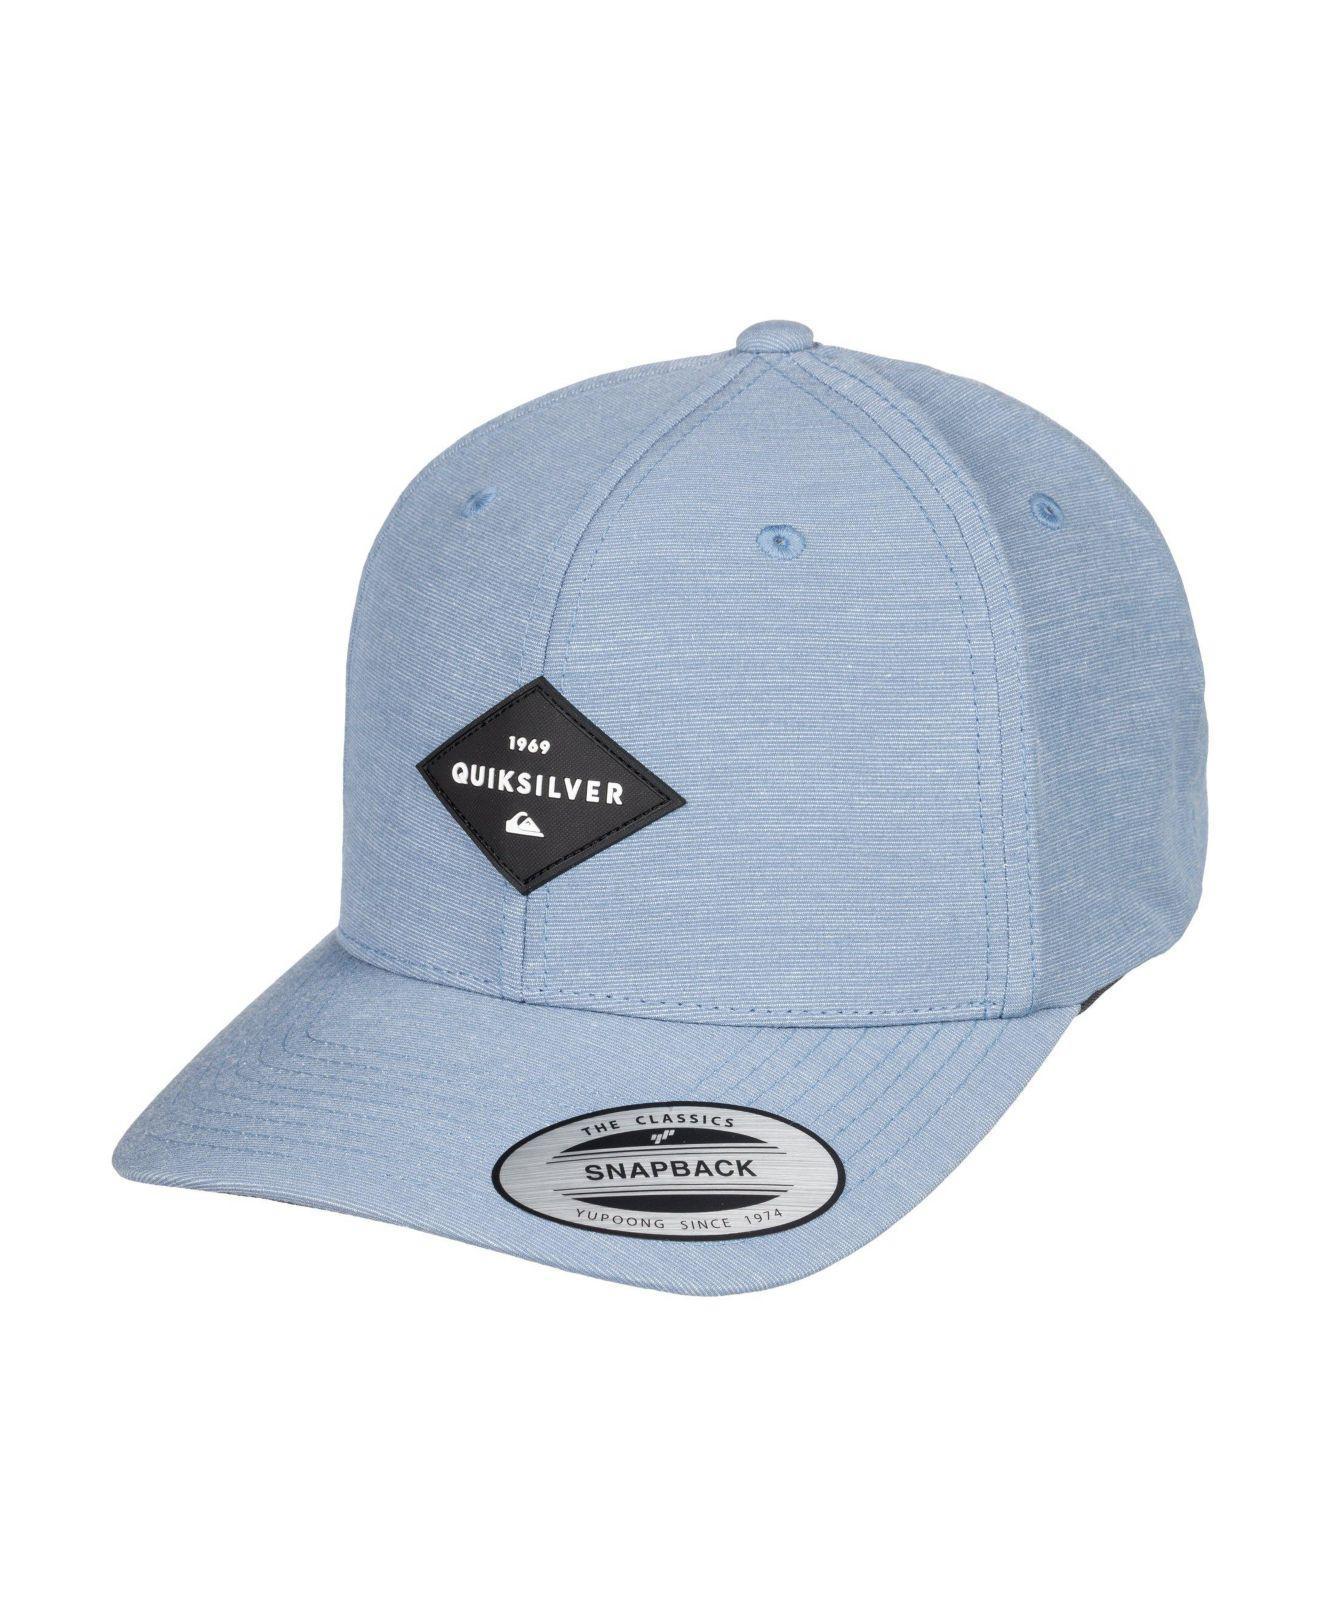 innovative design bdf9b b6580 Quiksilver - Blue Union Heather Snapback Hat for Men - Lyst. View fullscreen